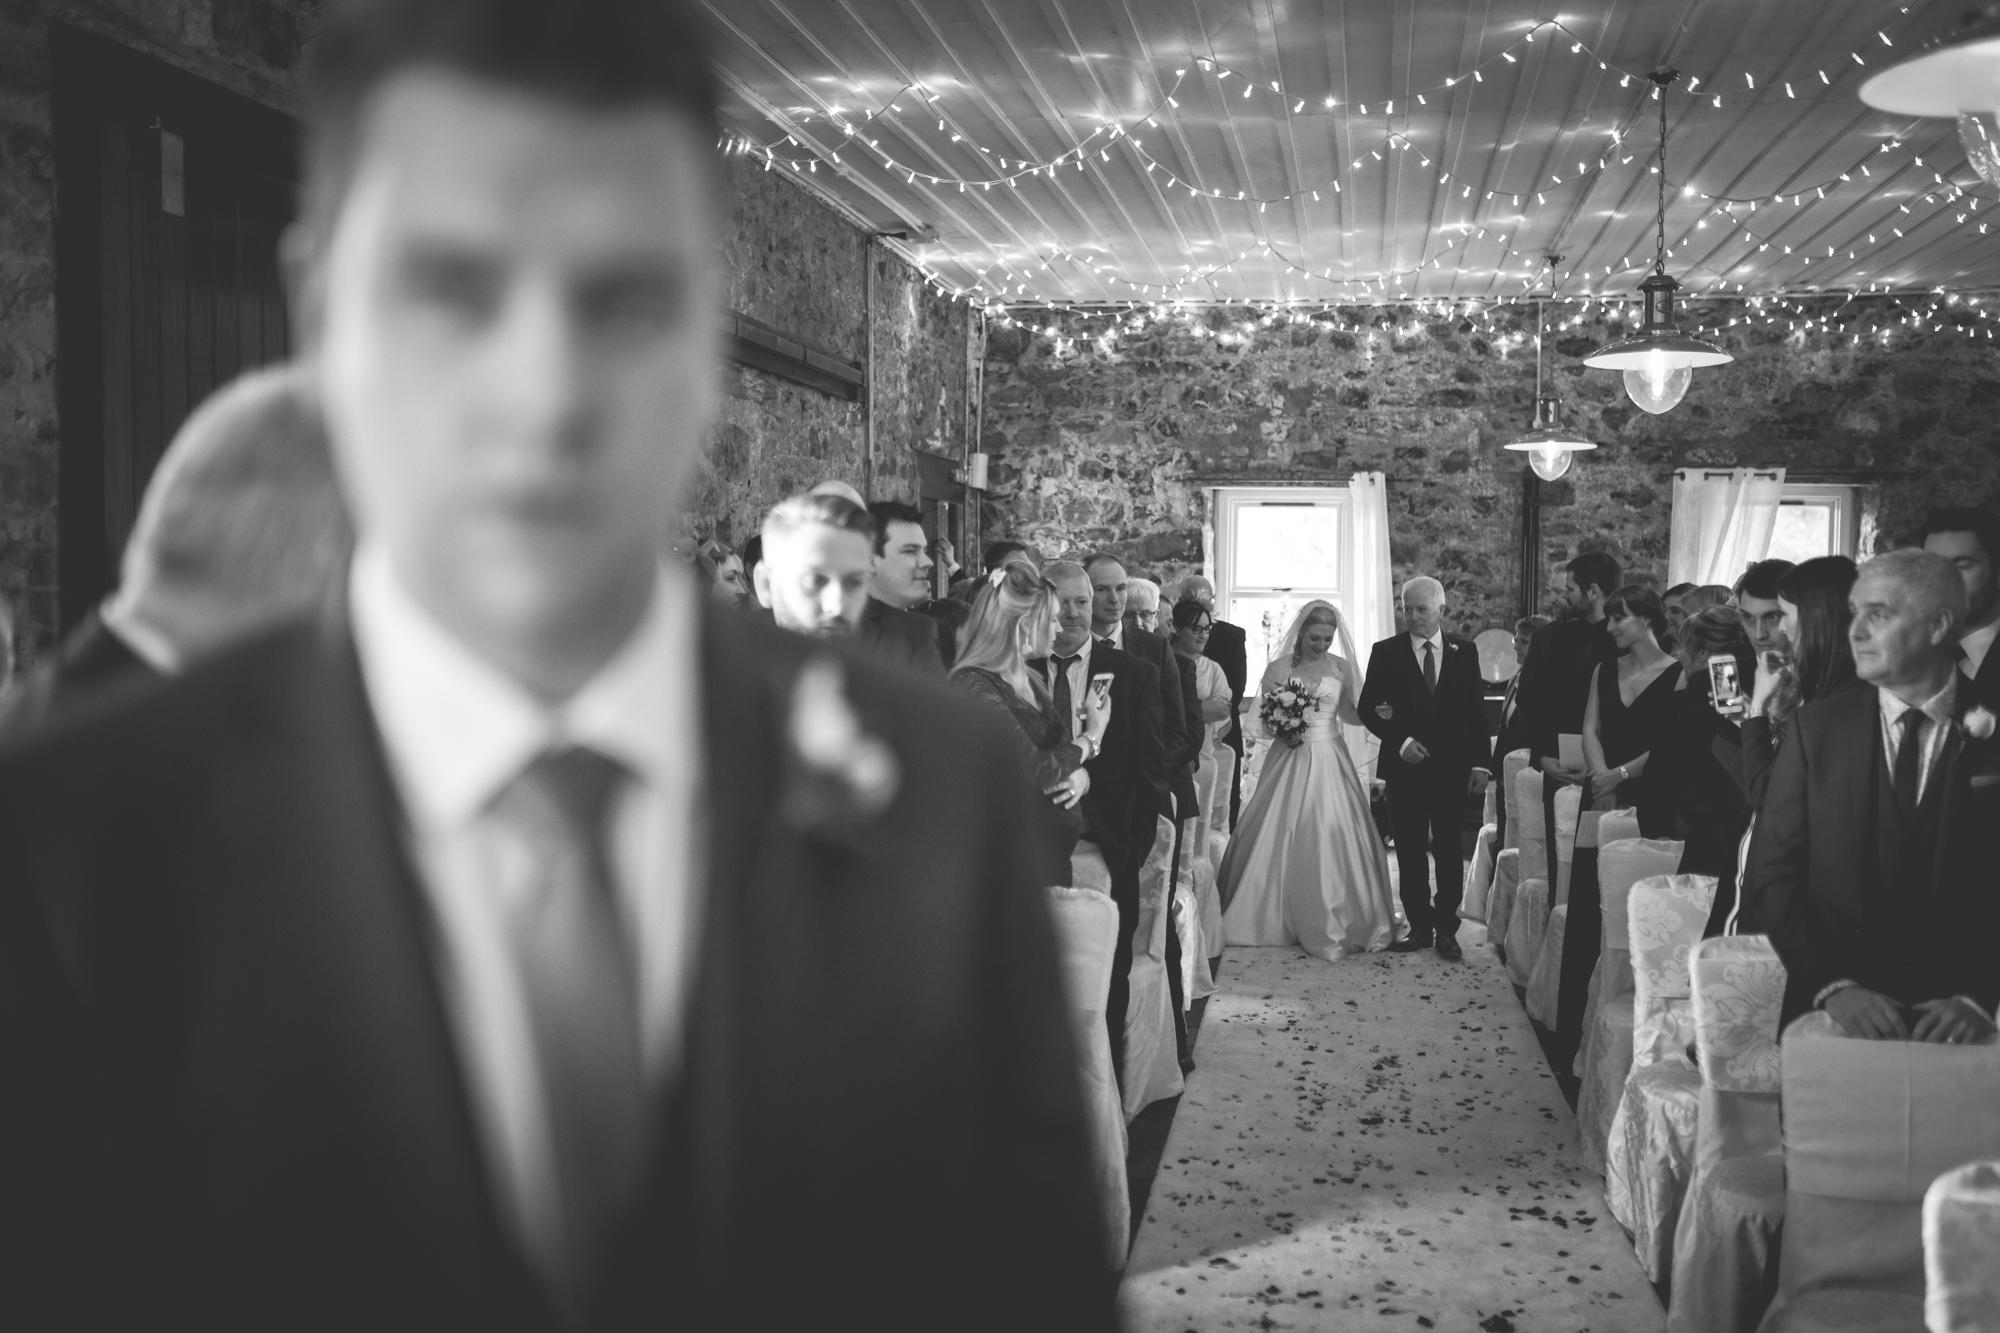 Steve_Emma_Ceremony-49.jpg